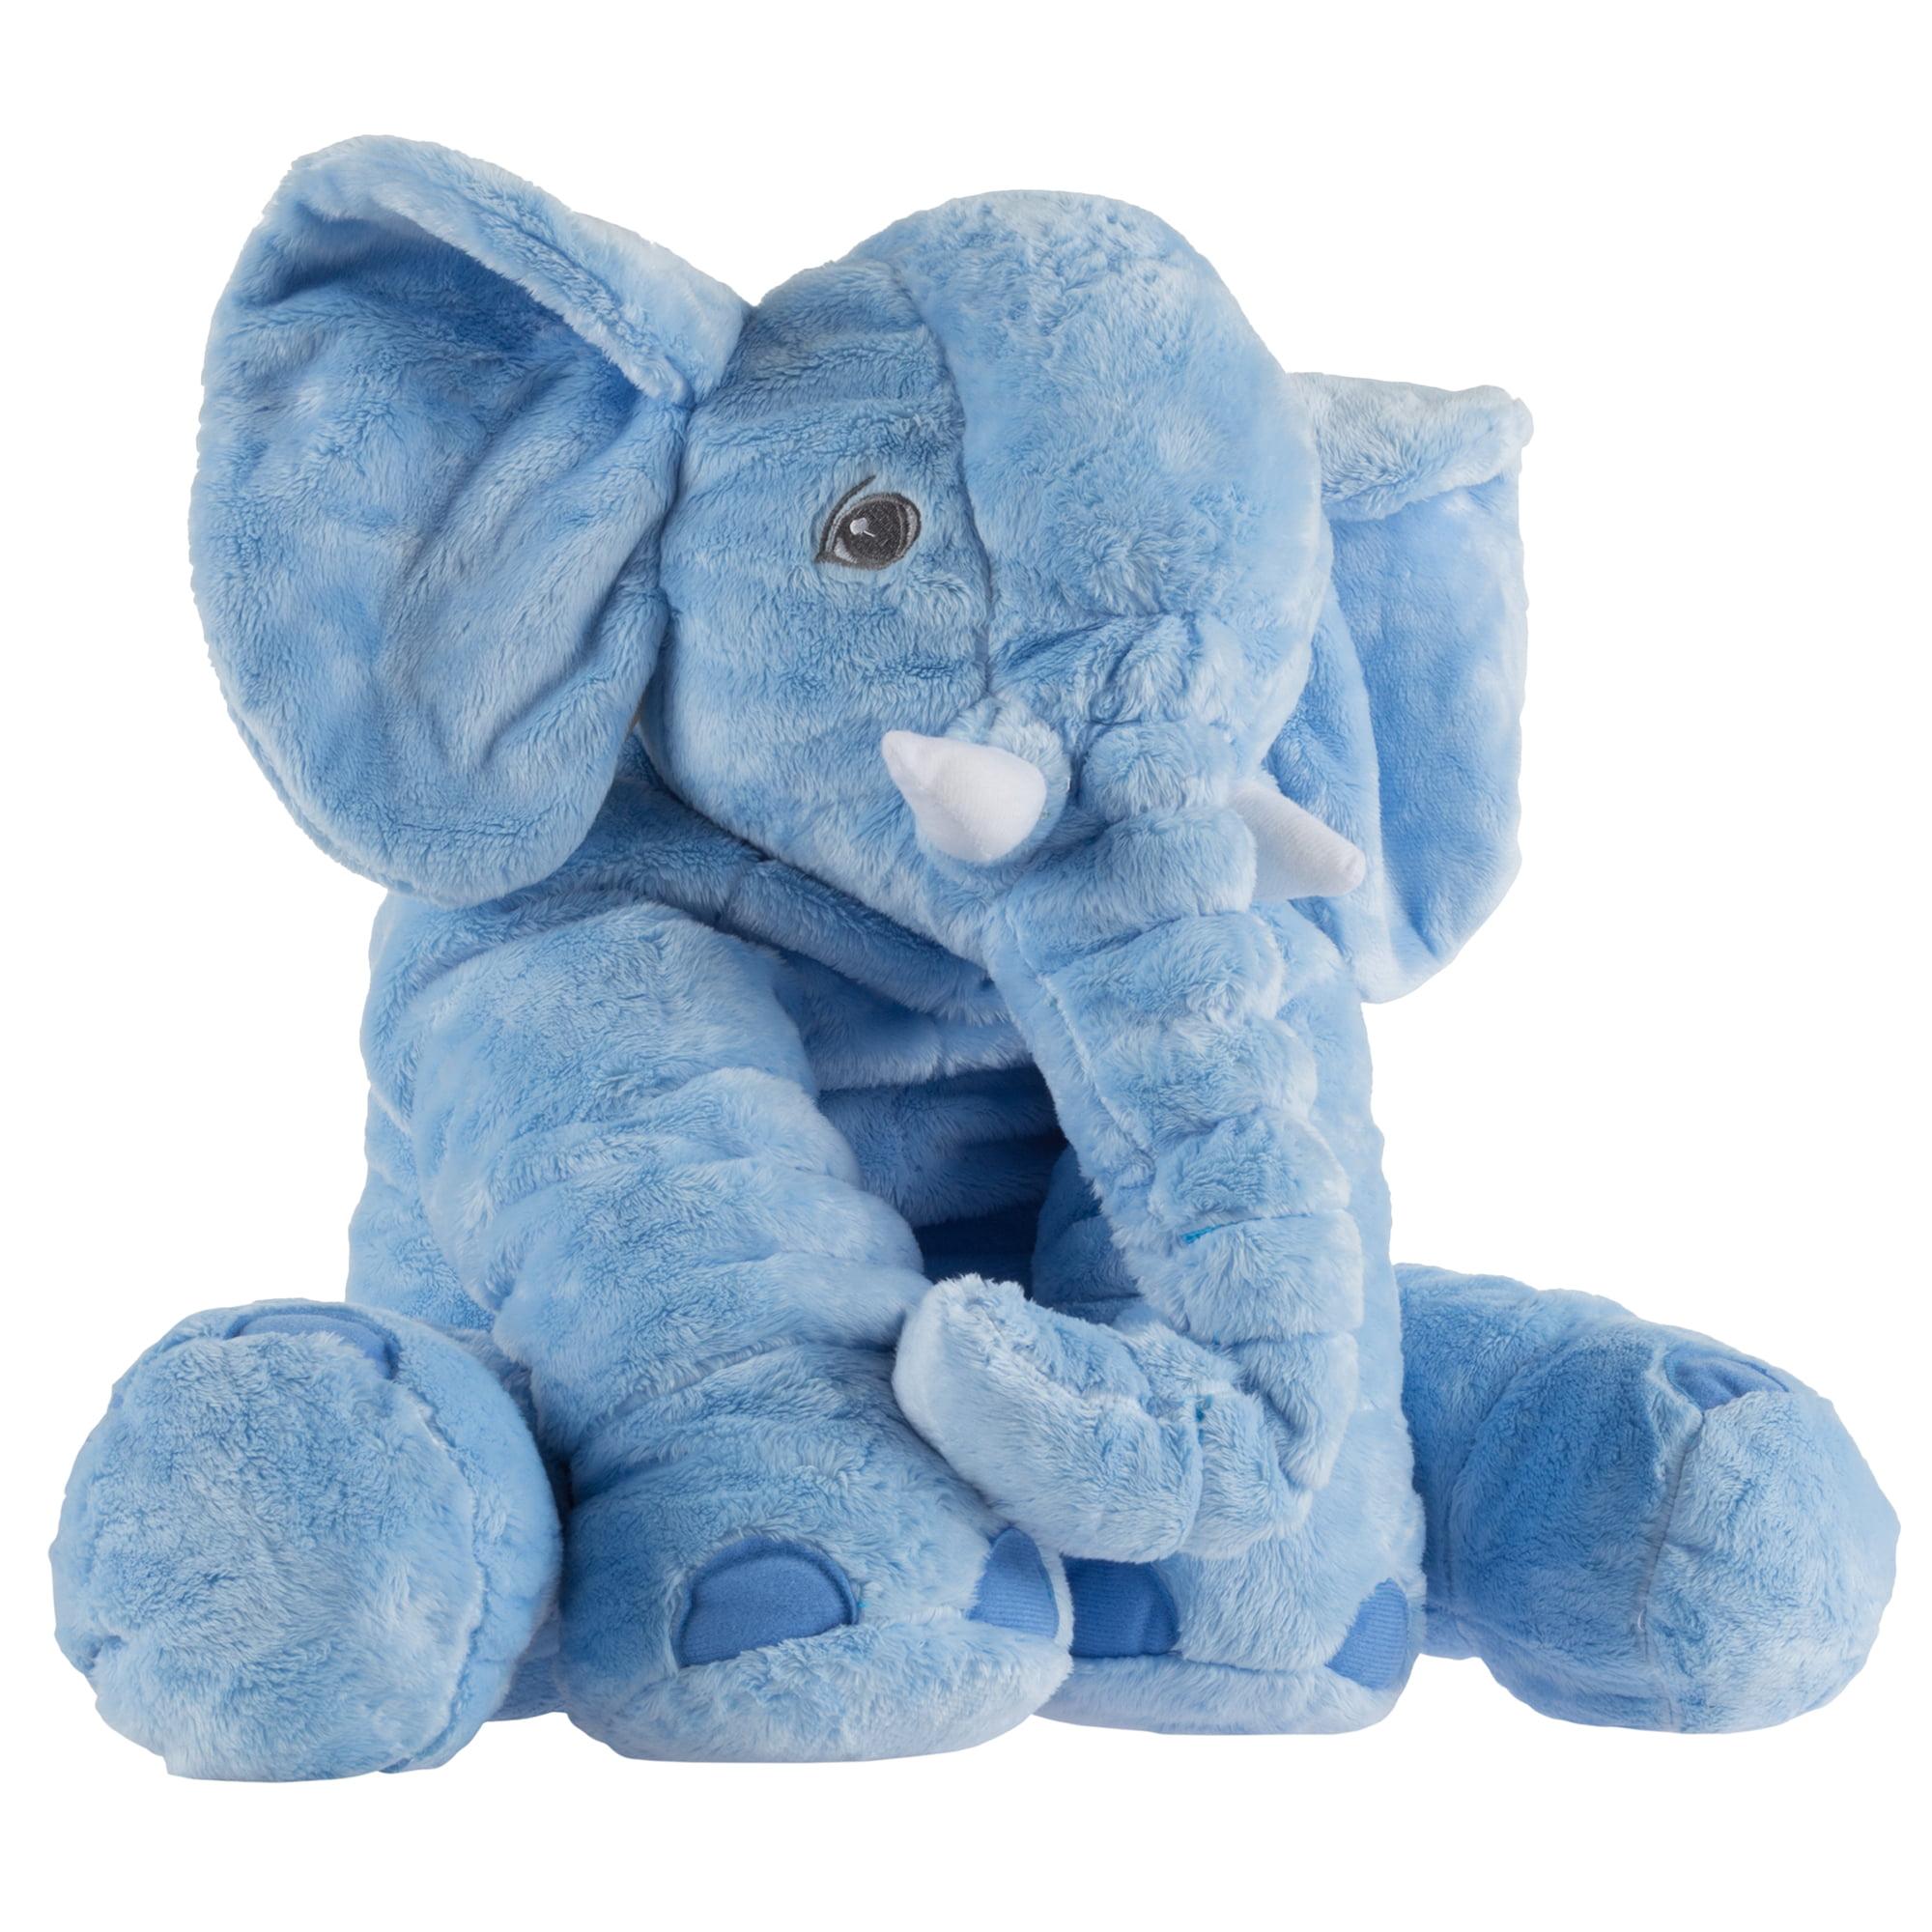 Elephant Stuffed Animal Toy Plush Soft Animal Pillow Friend For